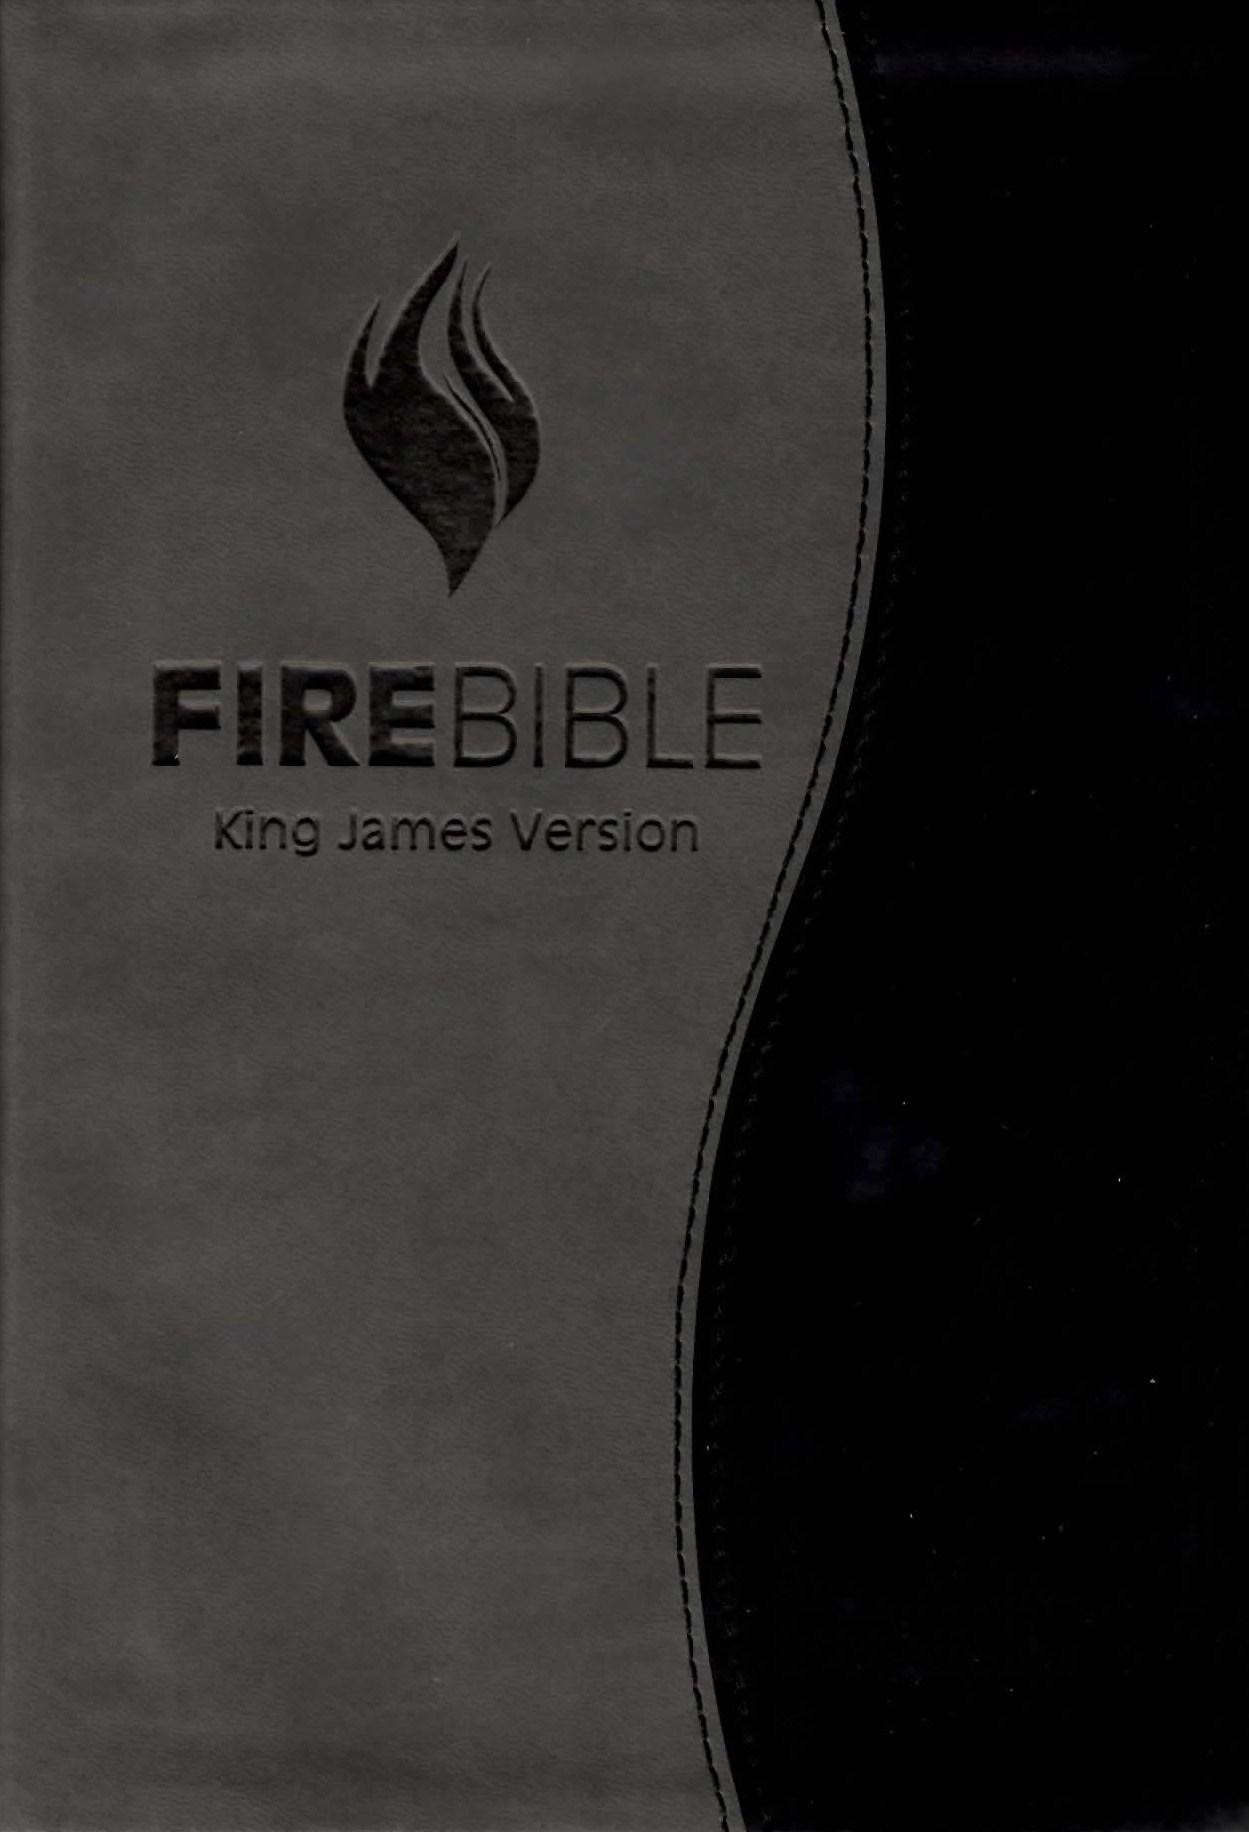 Full Life Study Bibles | ESV Fire Bibles | KJV Fire Bibles